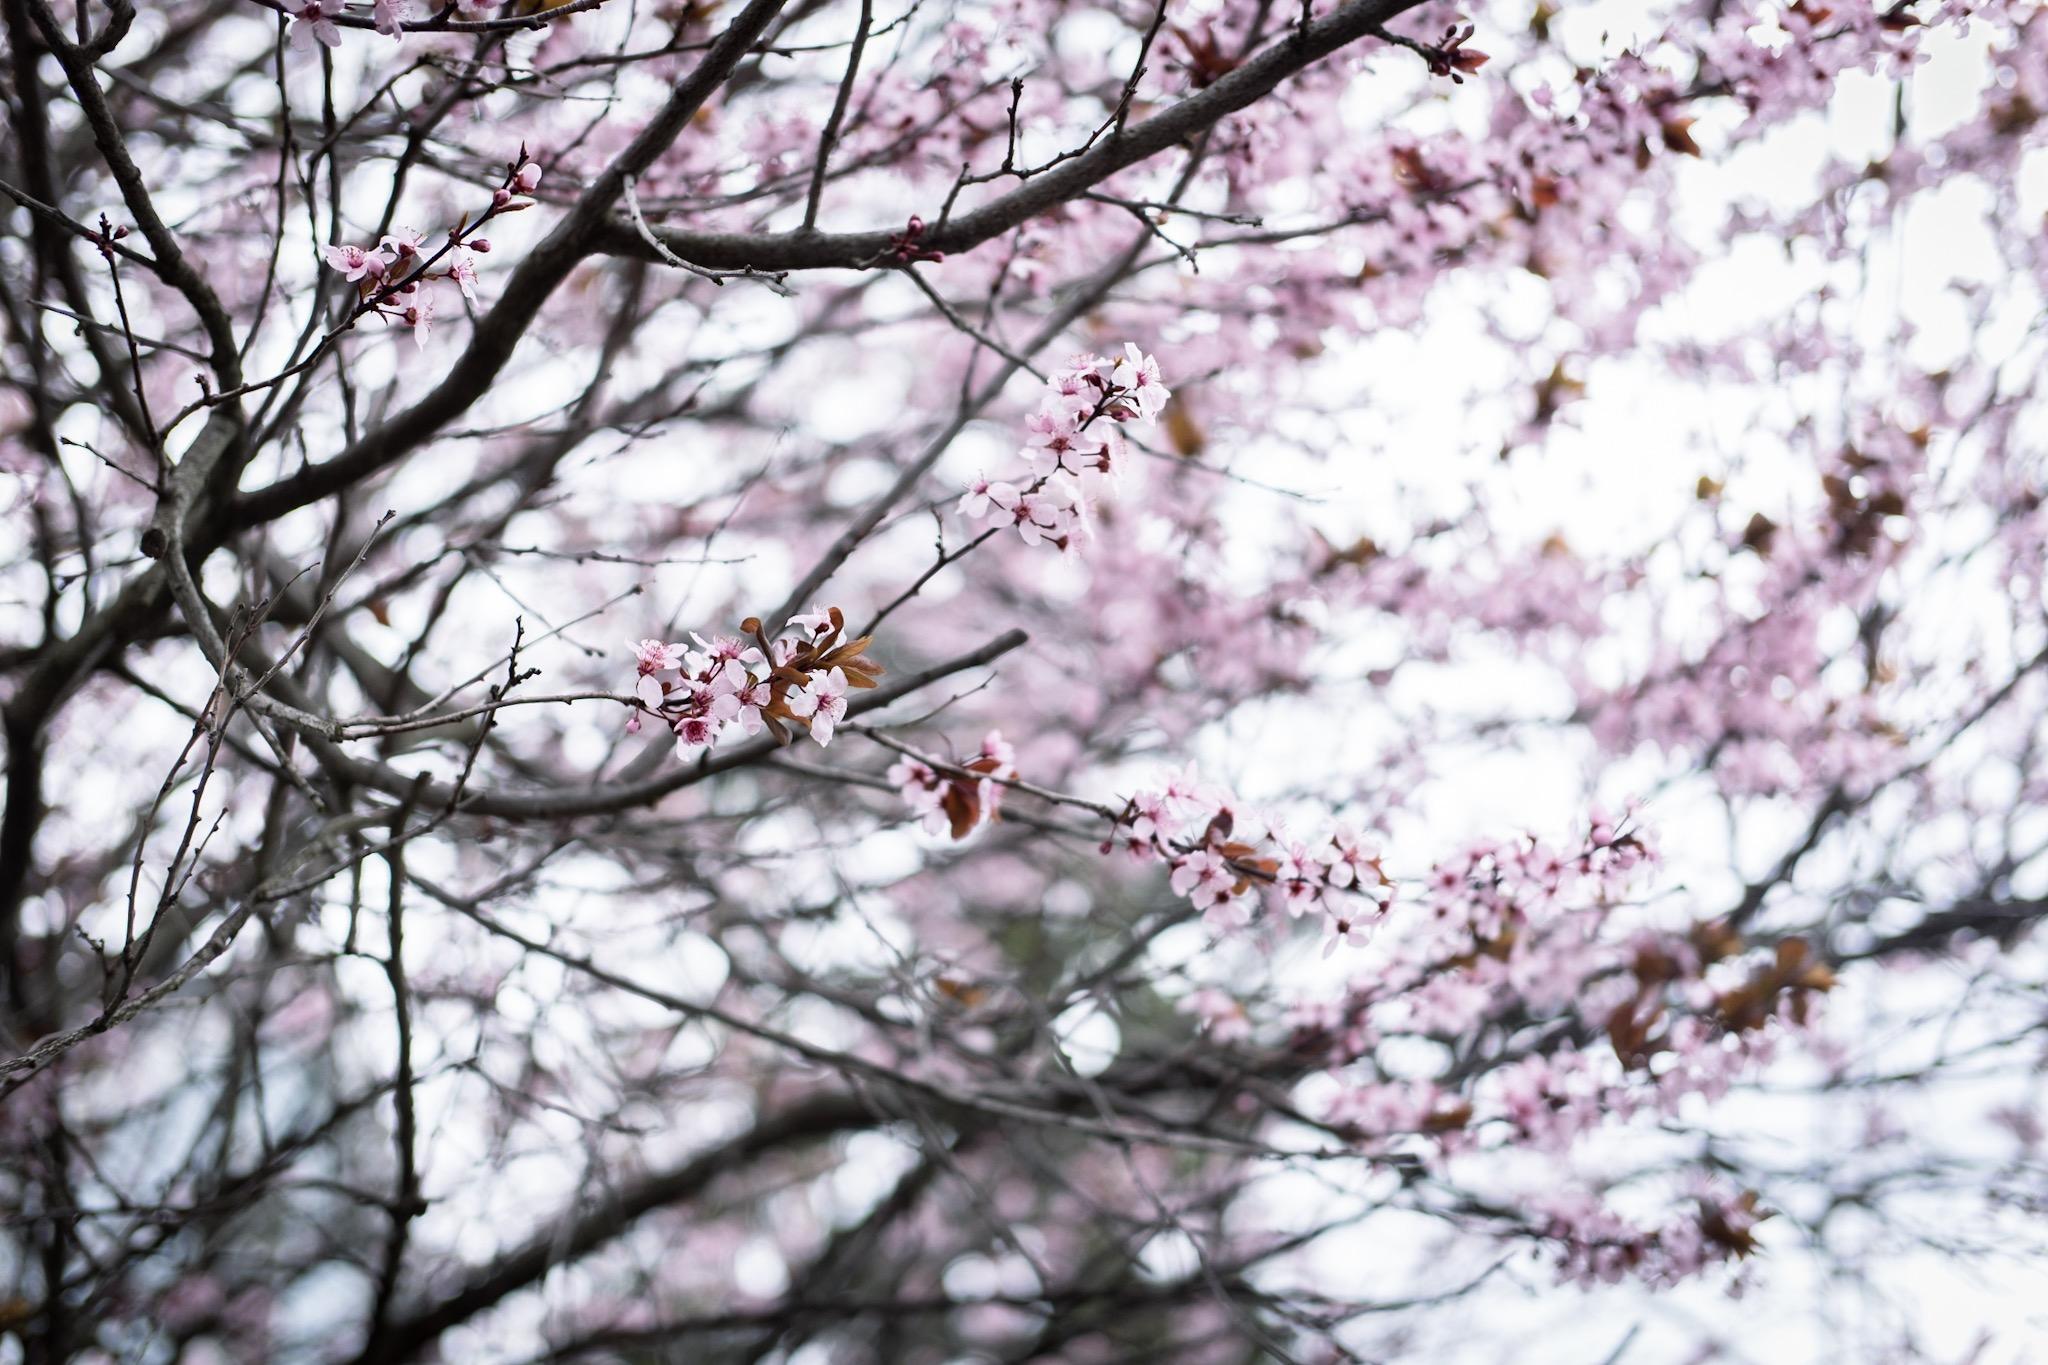 Photo 21-04-2019, 13.51.36.jpg